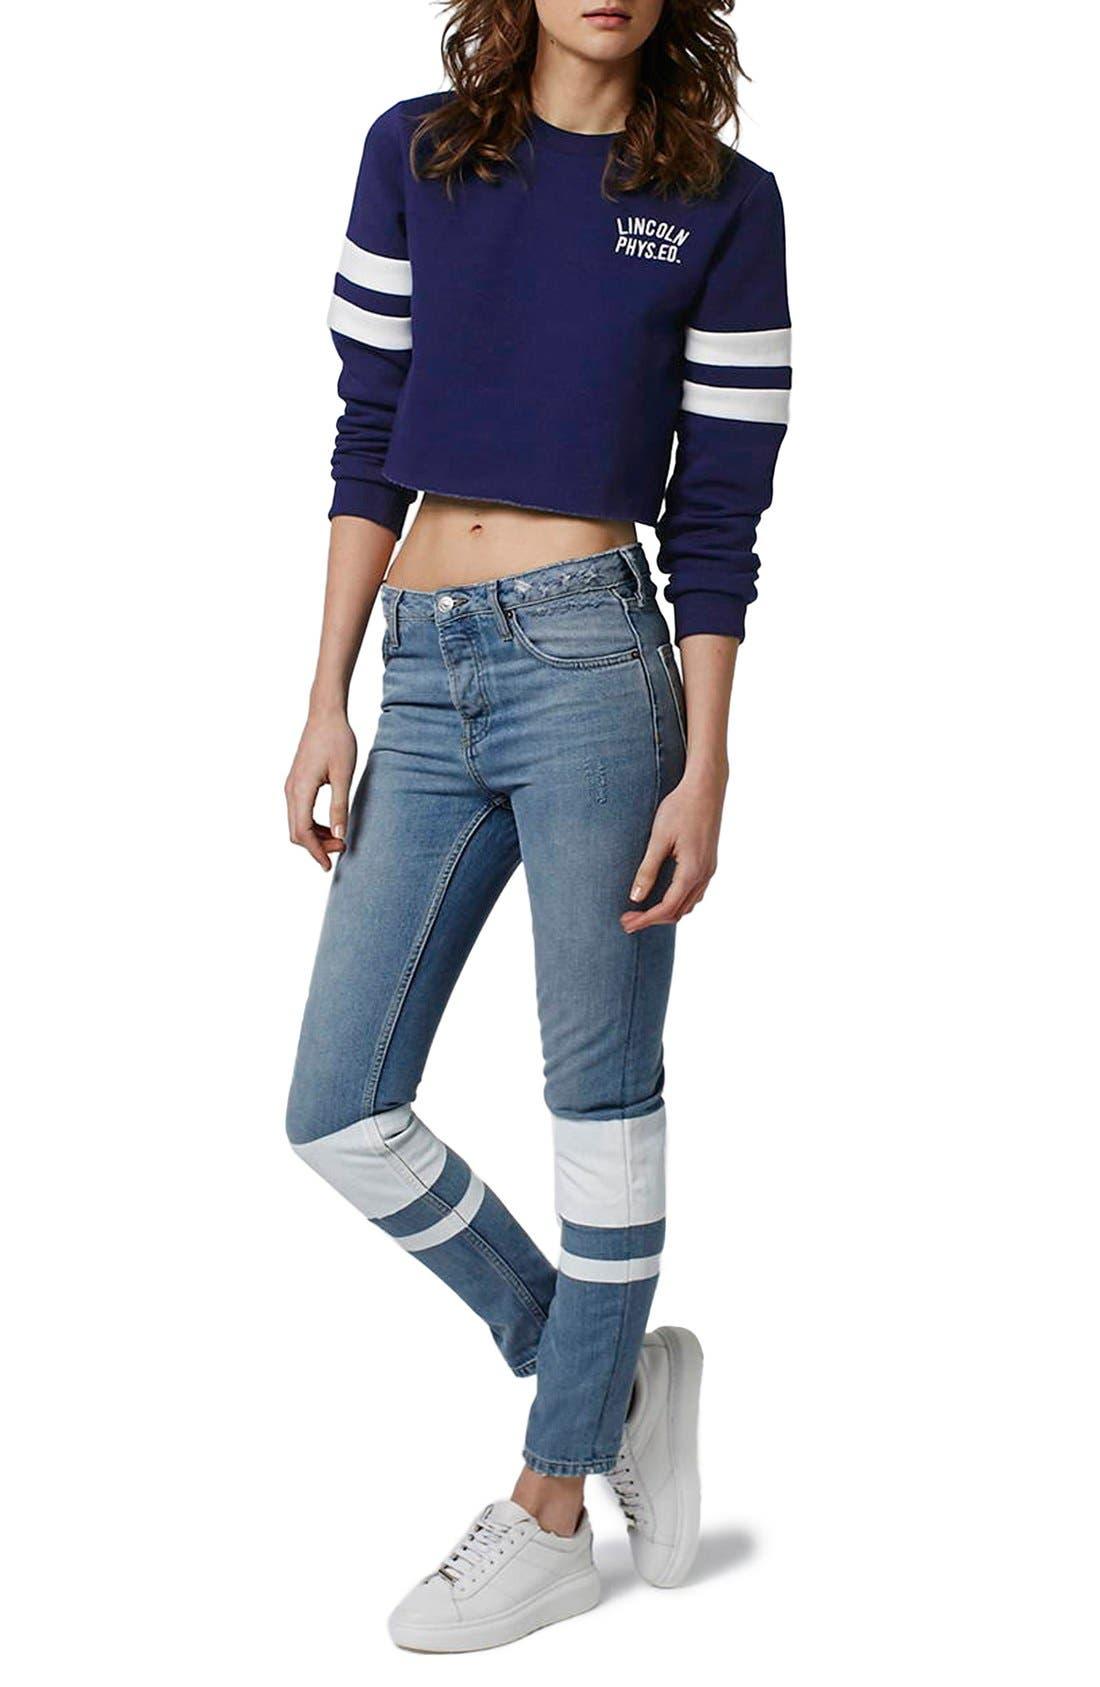 Alternate Image 2  - Topshop 'Lincoln Phys Ed' Crop Sweatshirt